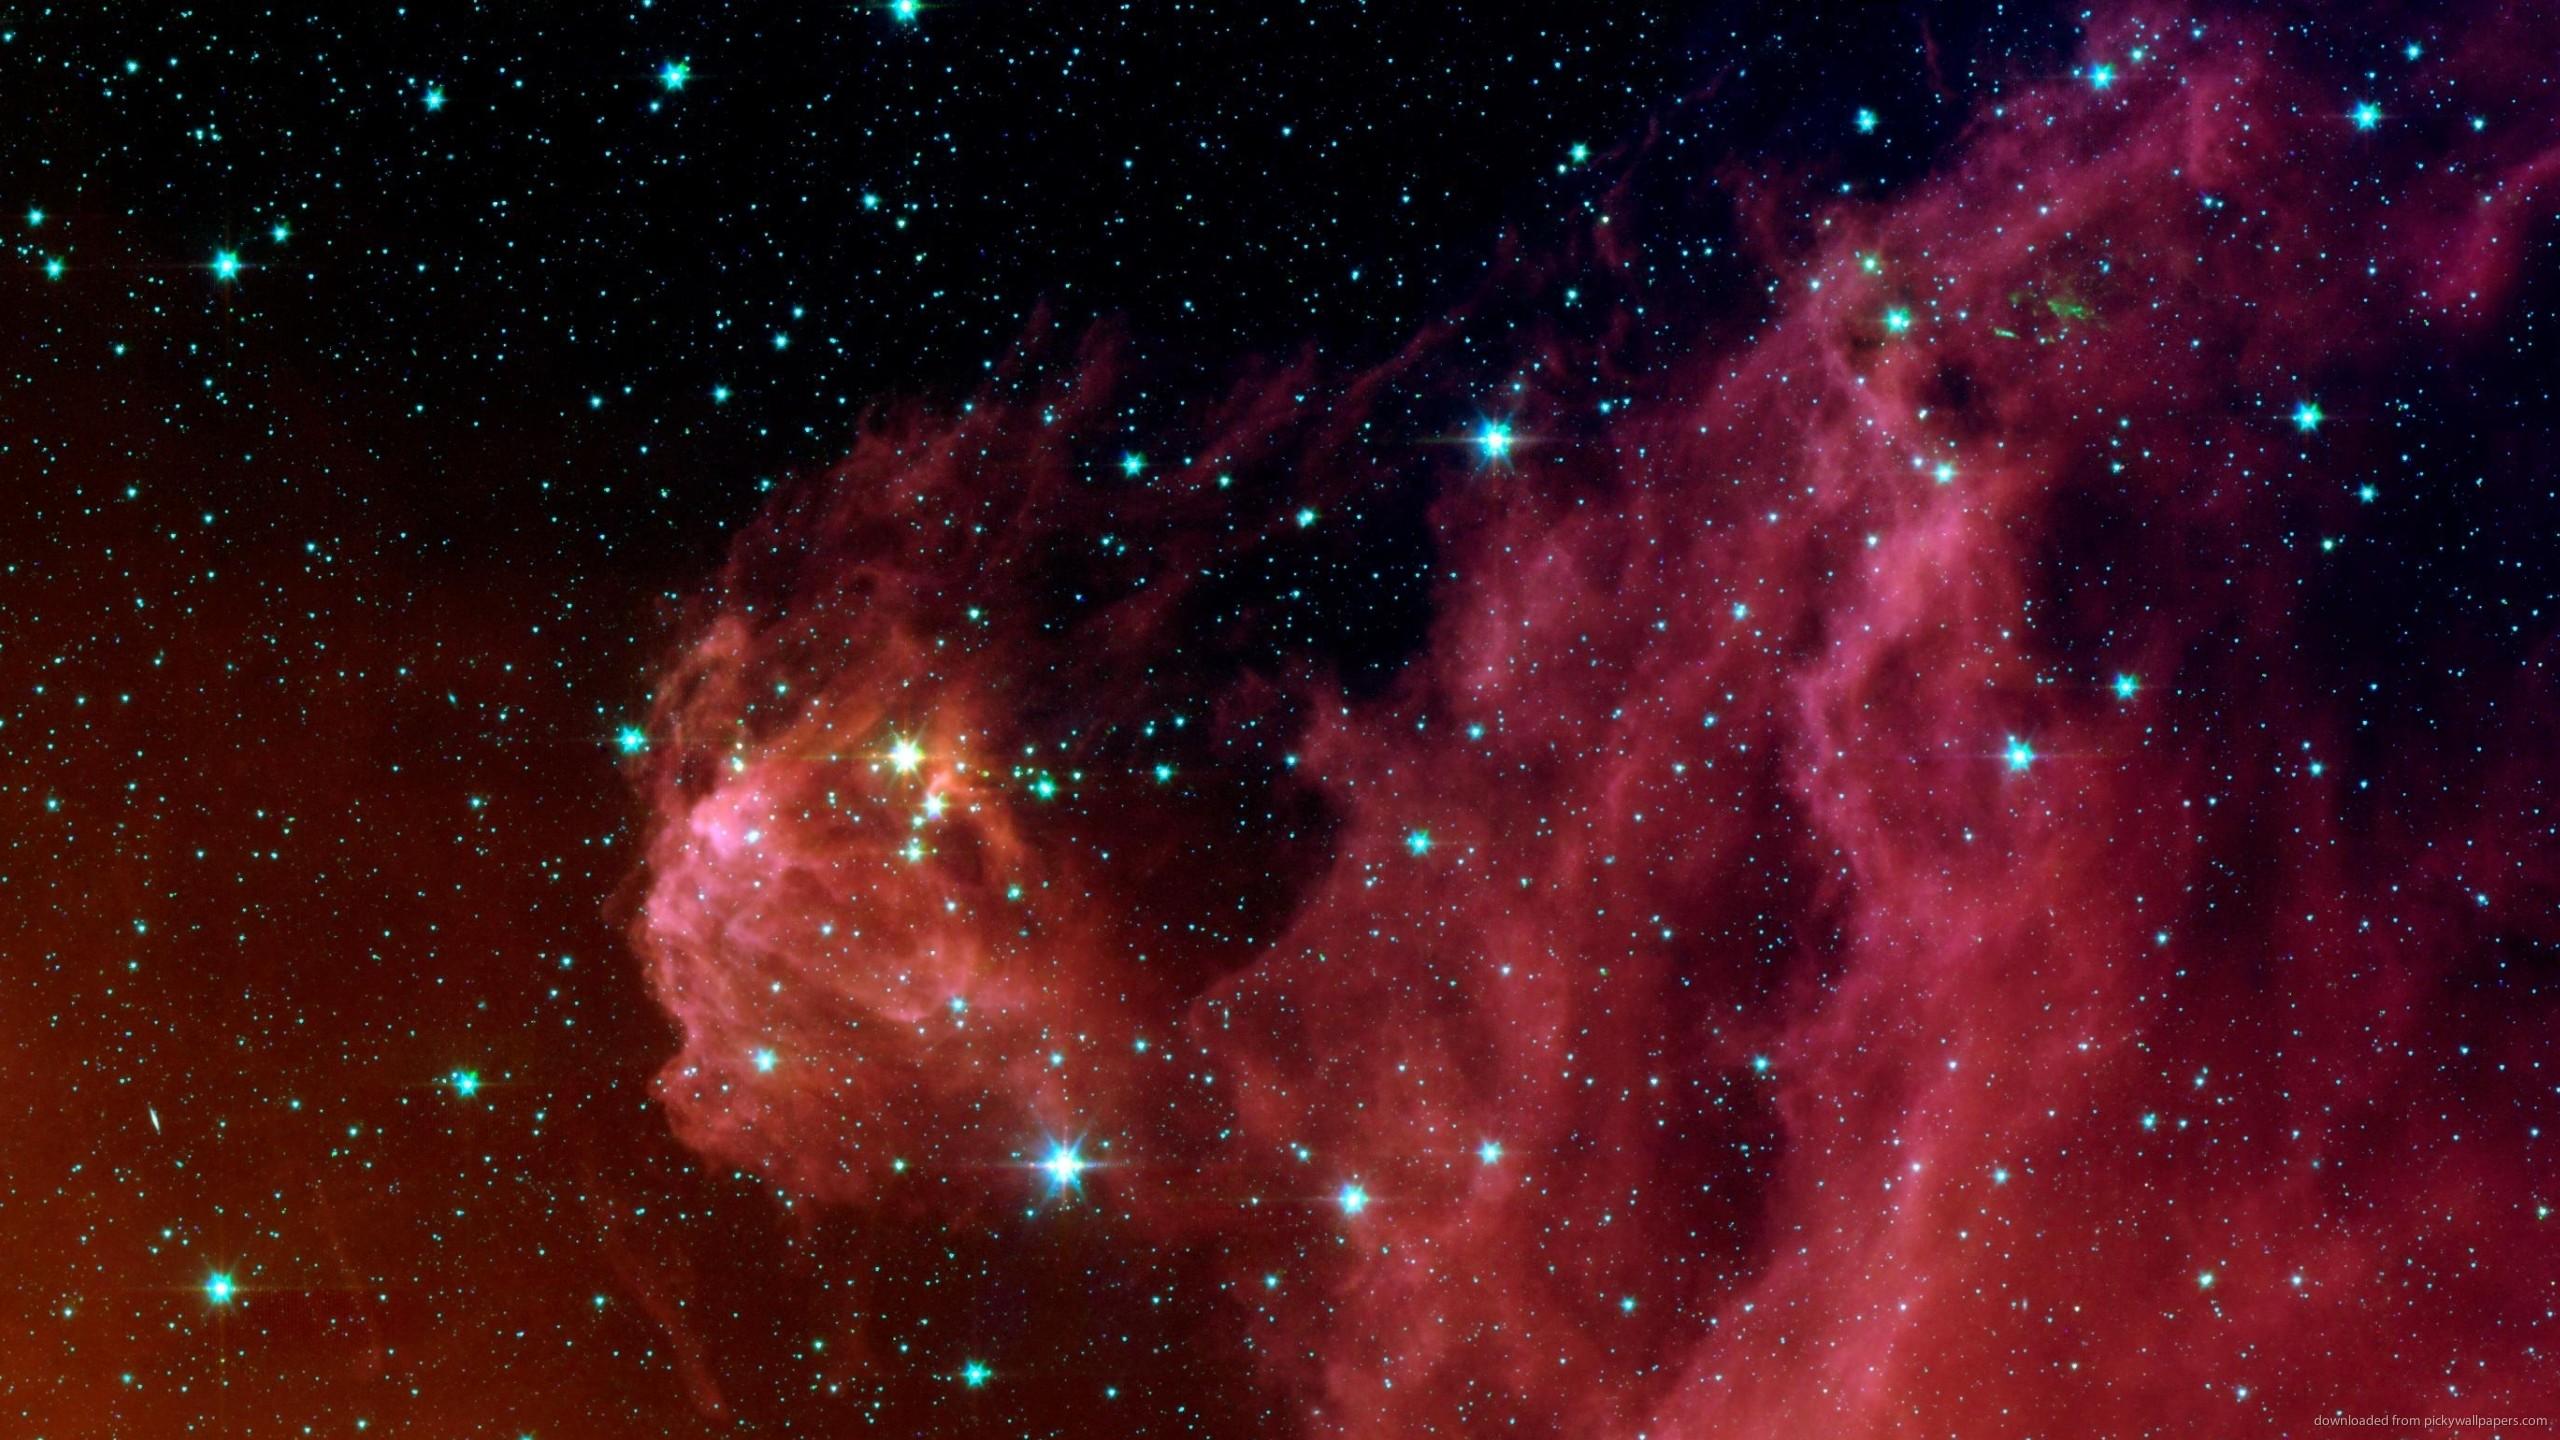 NASA Spitzer Space Telescope's Photo for 2560×1440